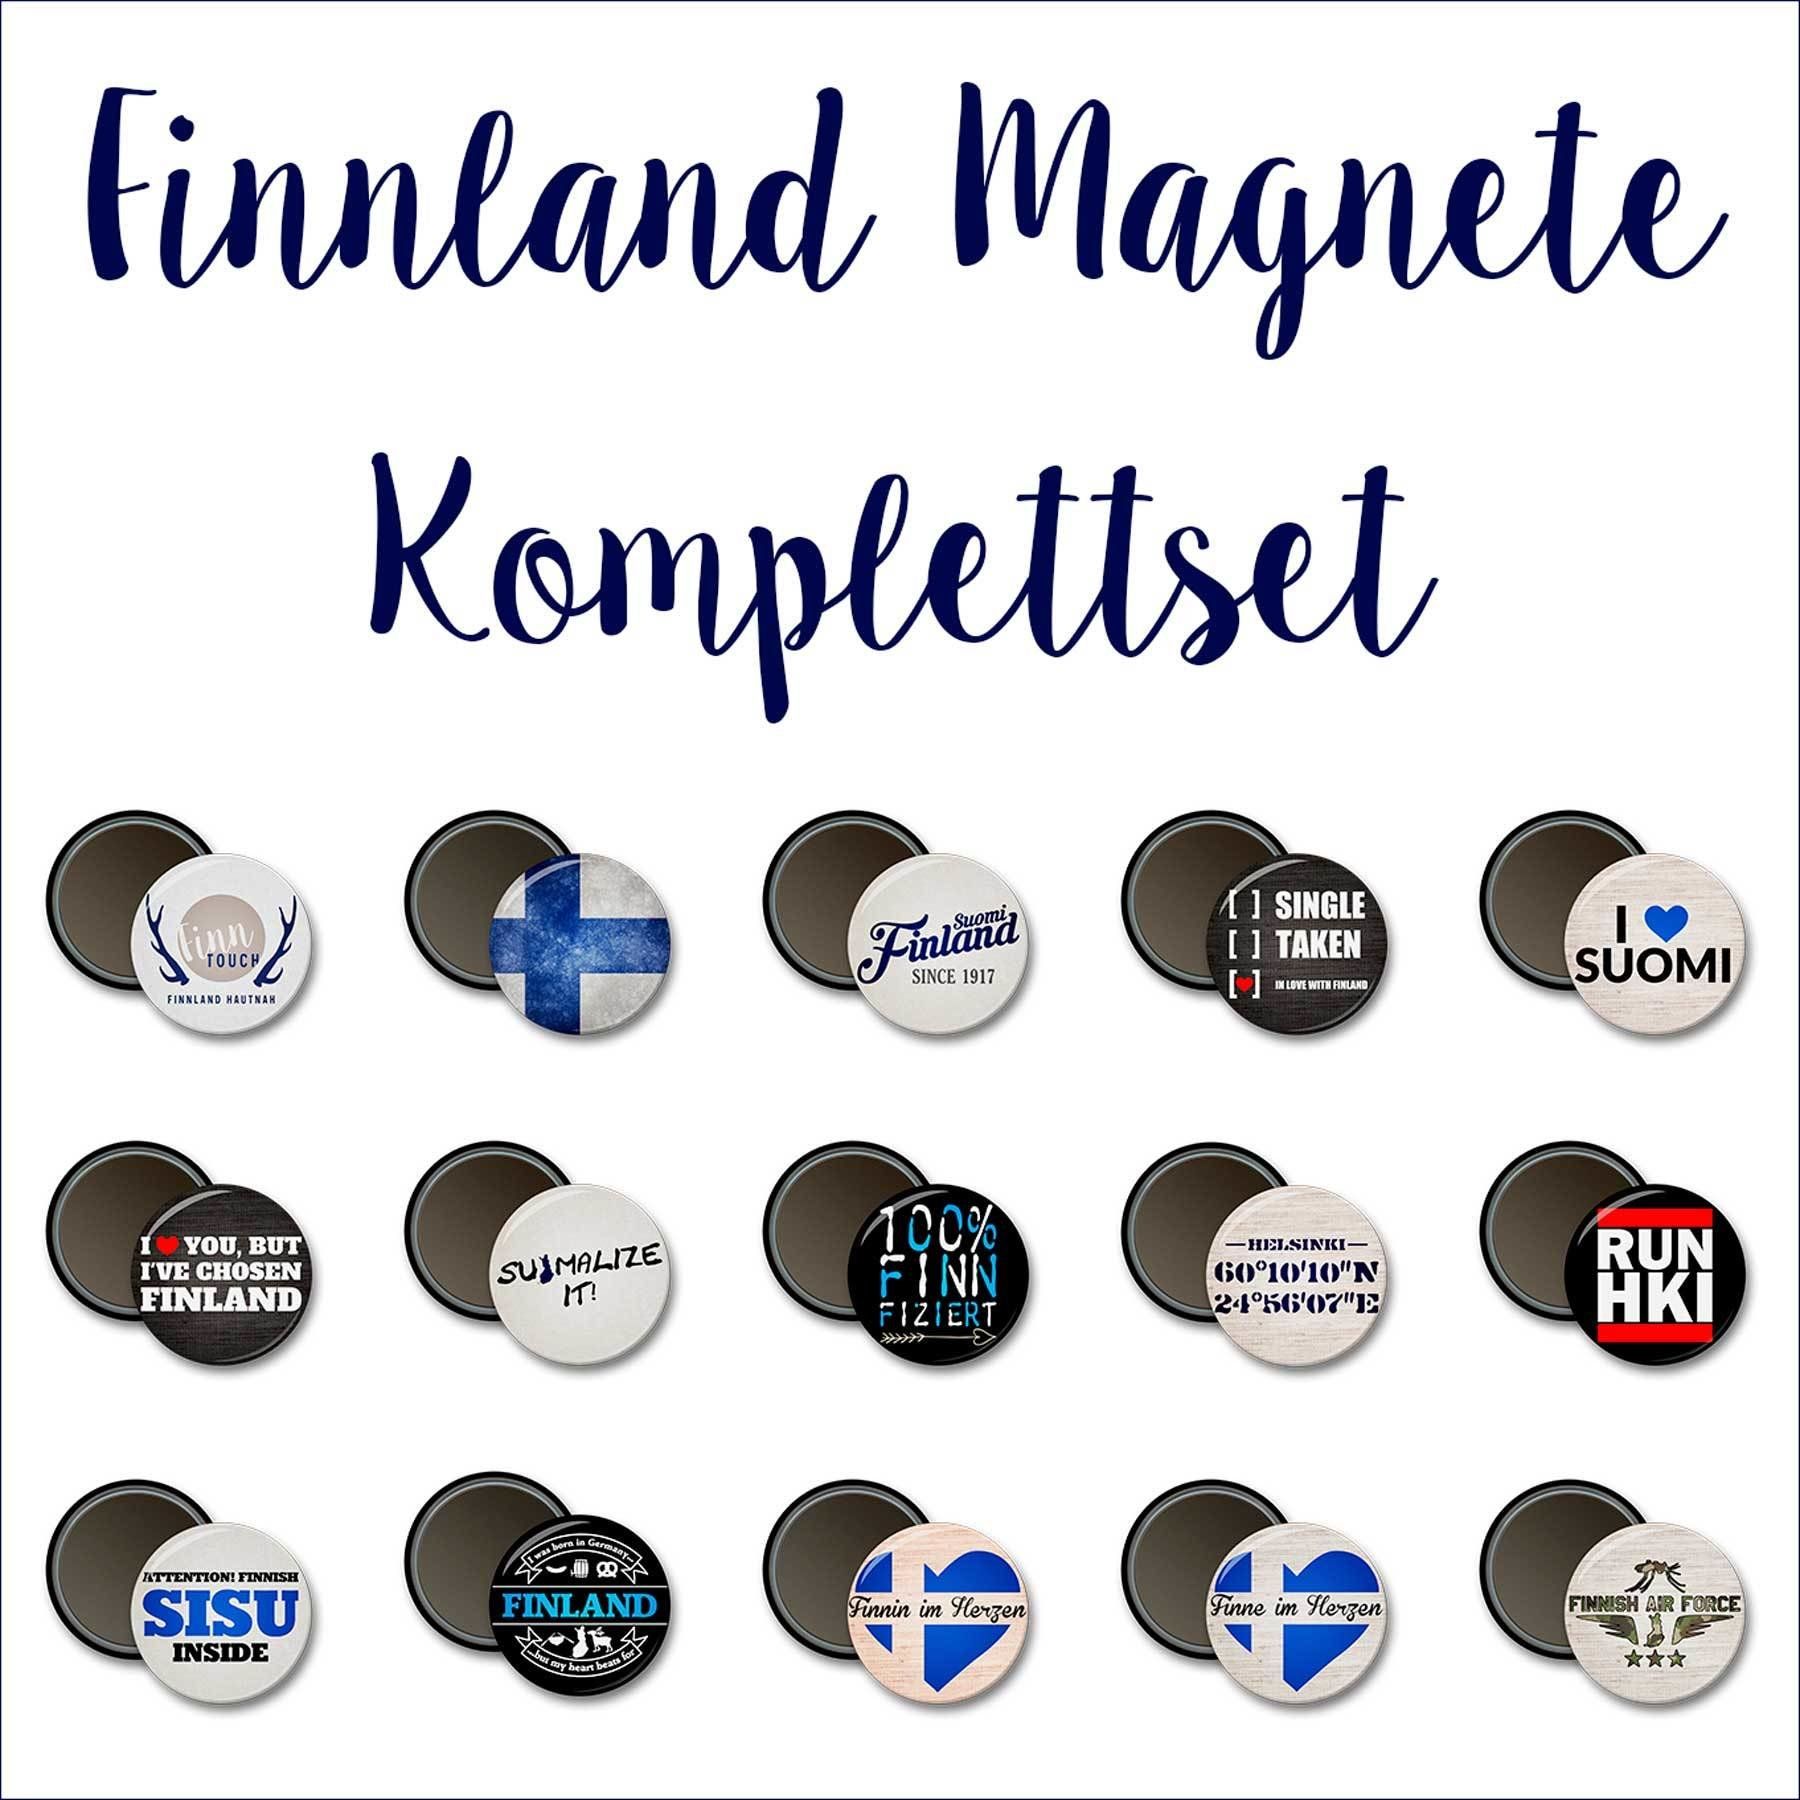 Finnland Magnete Komplettset (Inhalt 15 Stück) M1-FT 78377